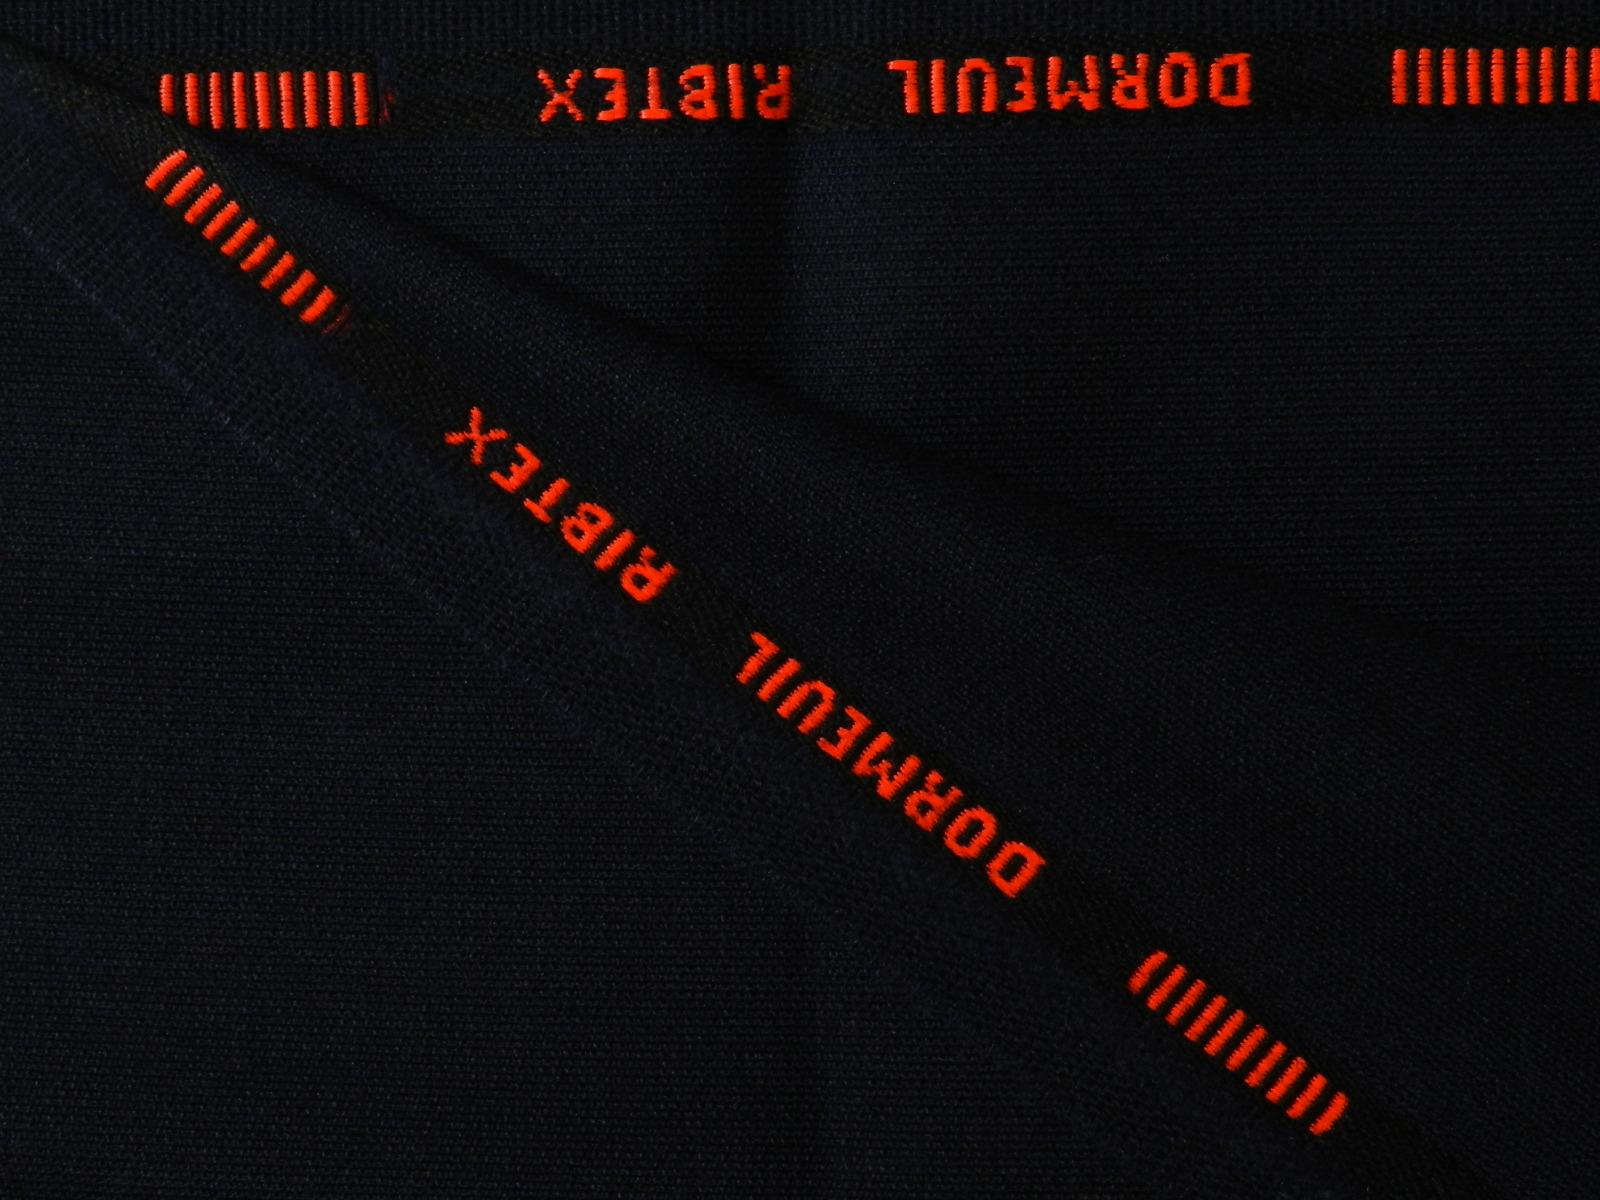 DORMEUIL(ドーメル) / RIBTEX / ENGLAND / ネイビー 系 / 織り柄 系